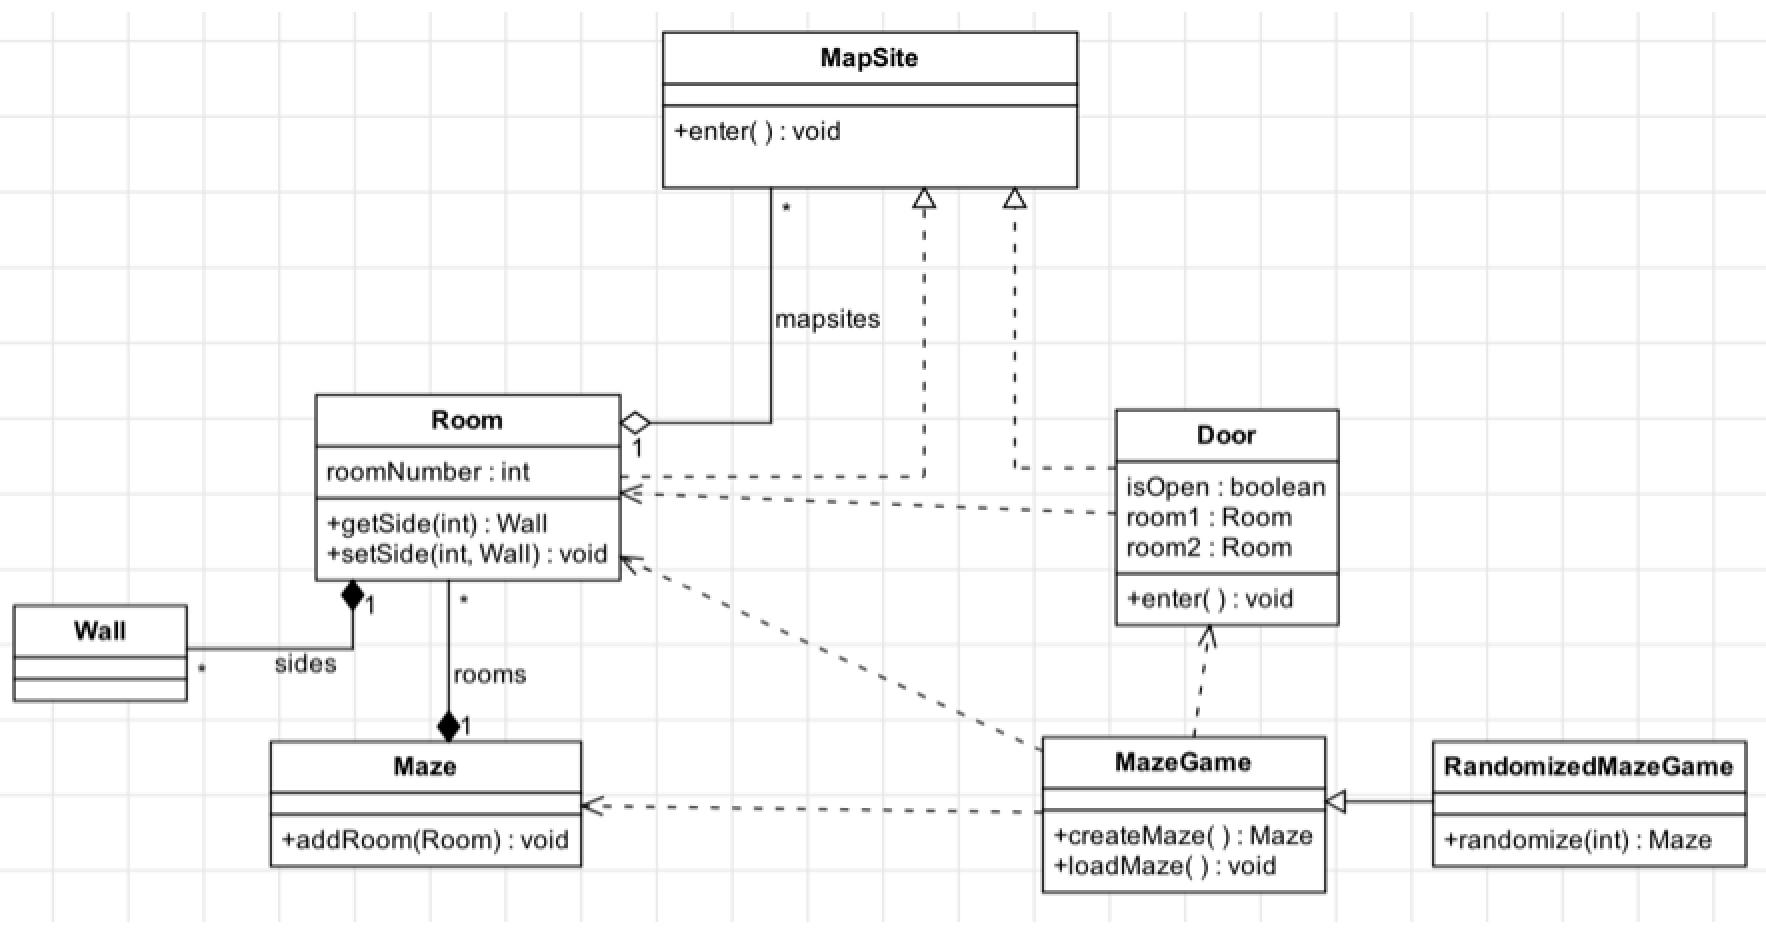 GitHub - luonglearnstocode/SD2x: My solutions to Homeworks